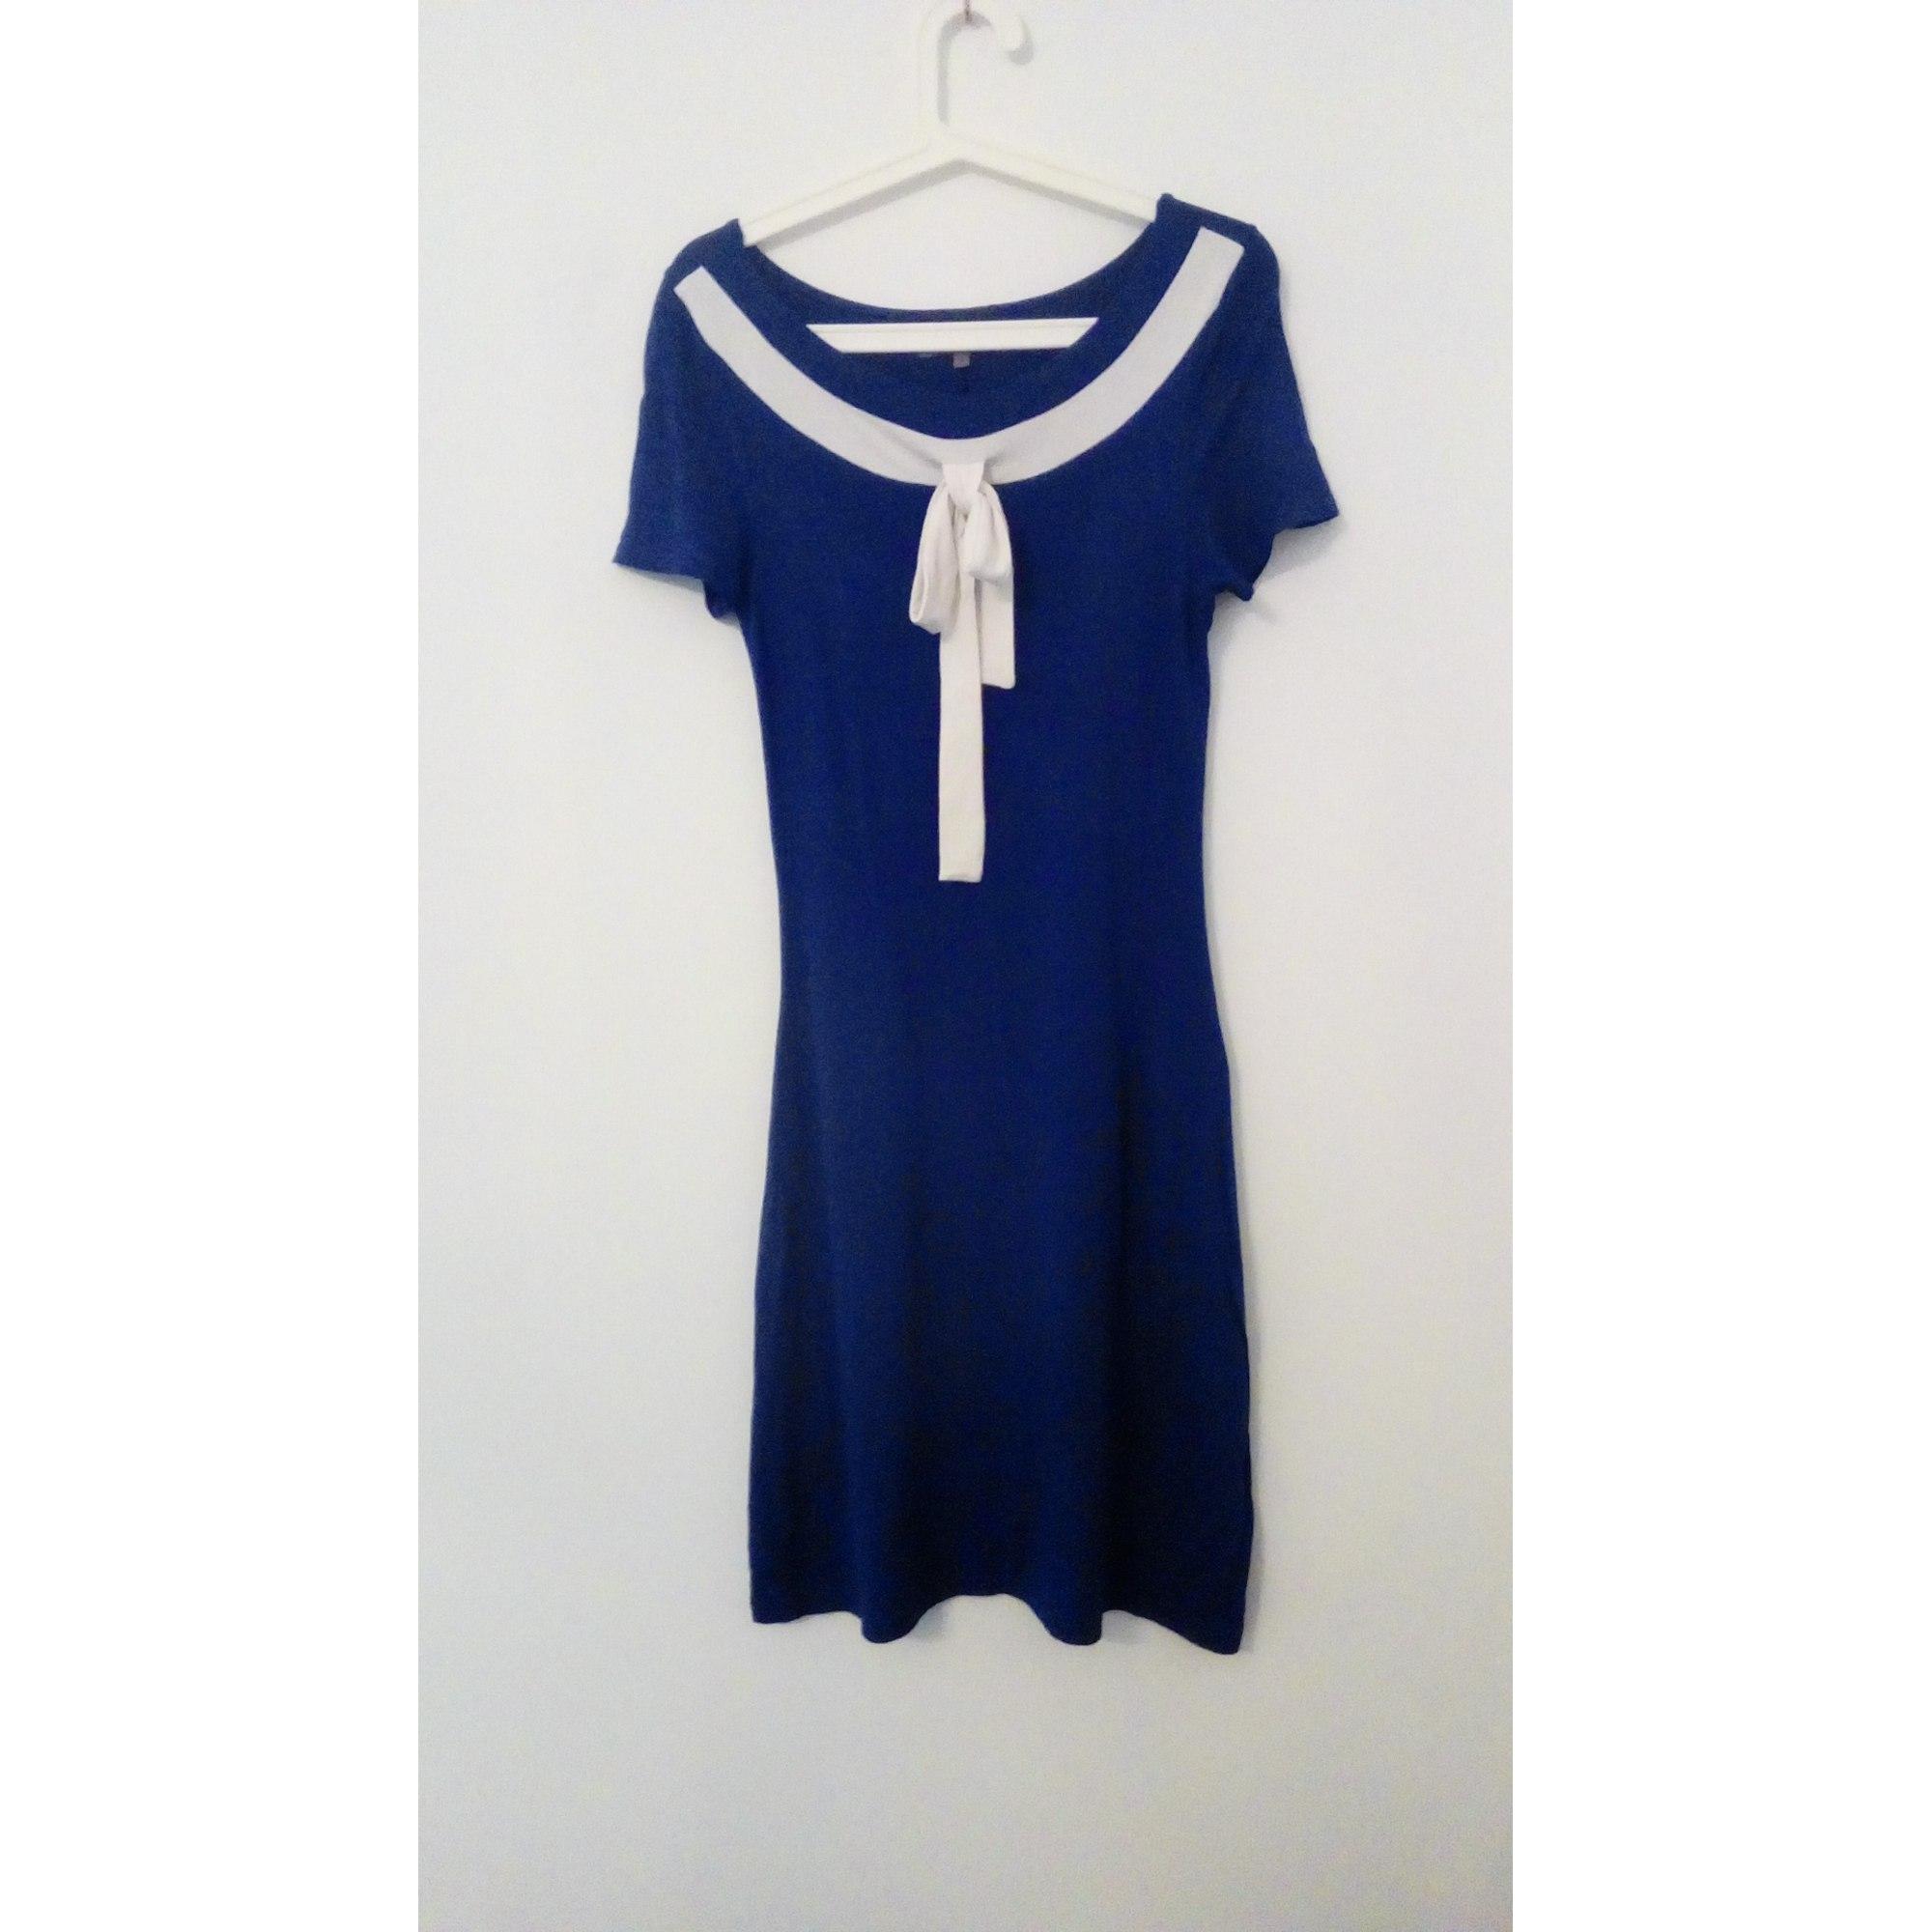 0ed30f70c03 Zalando Robe Robe Bleu Zalando Marine Femme ZBBUw